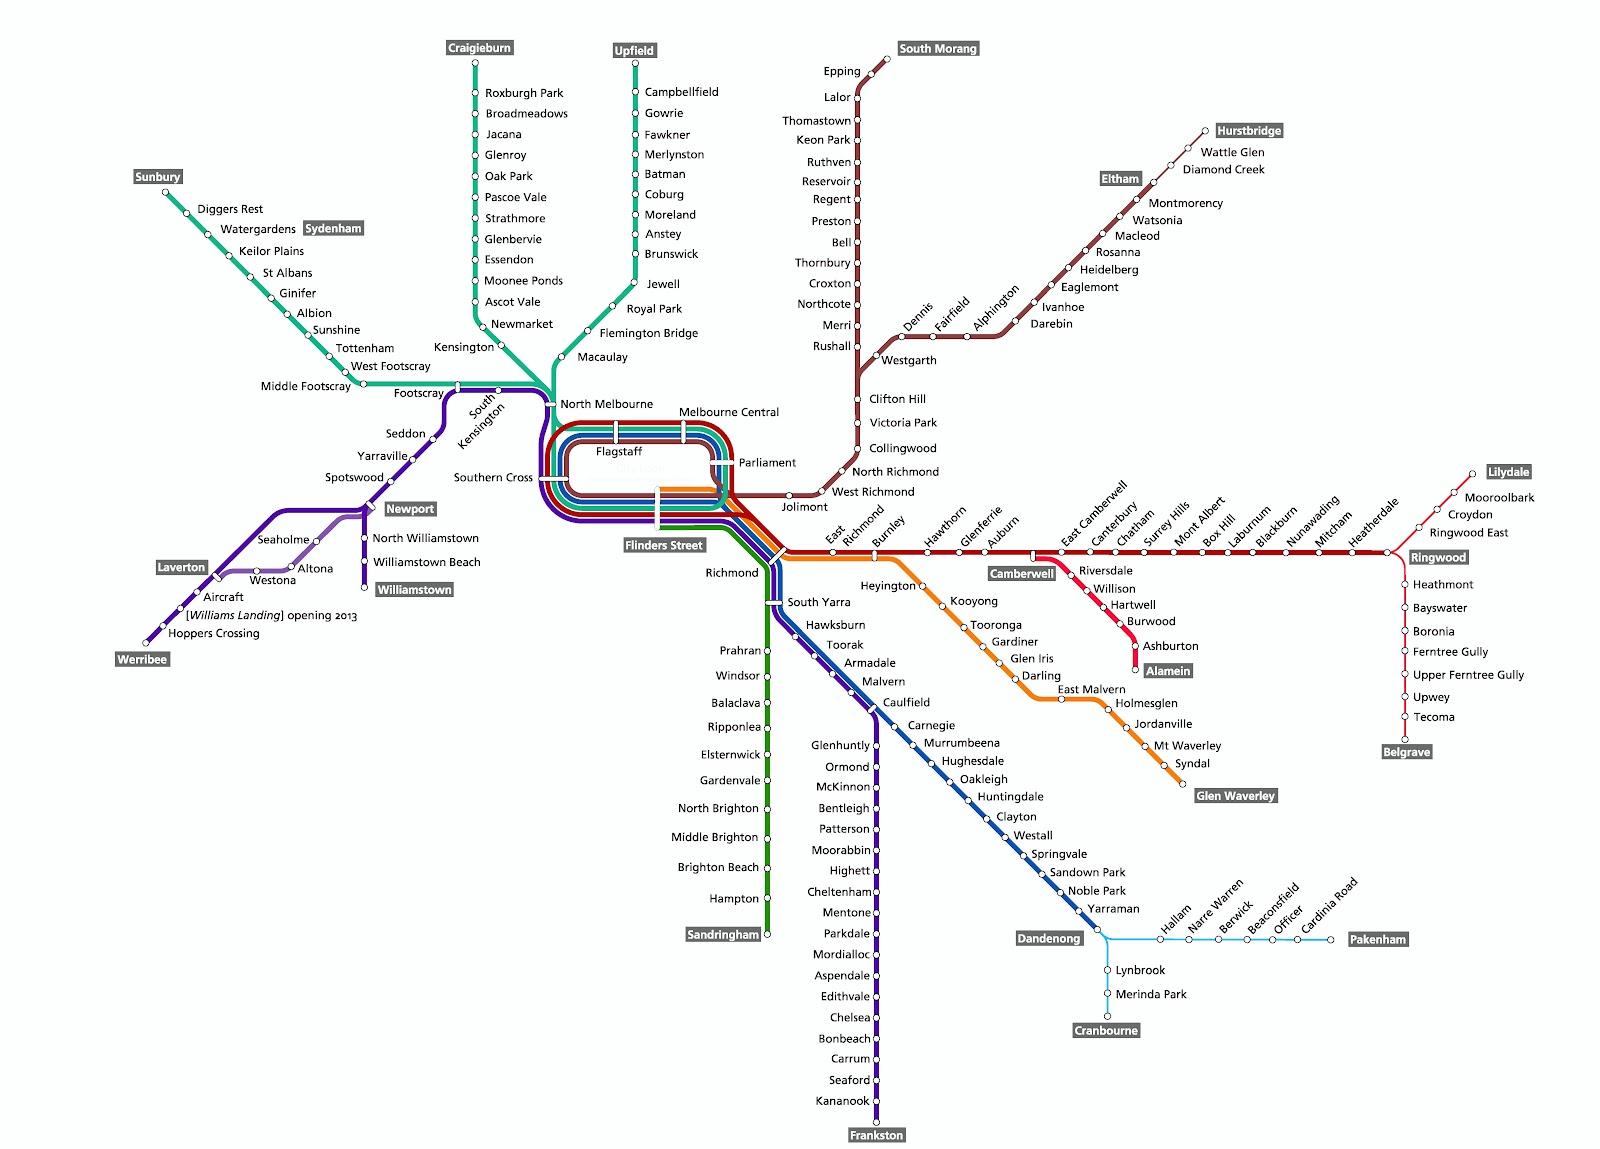 1000 Images About Public Transport Maps On Pinterest